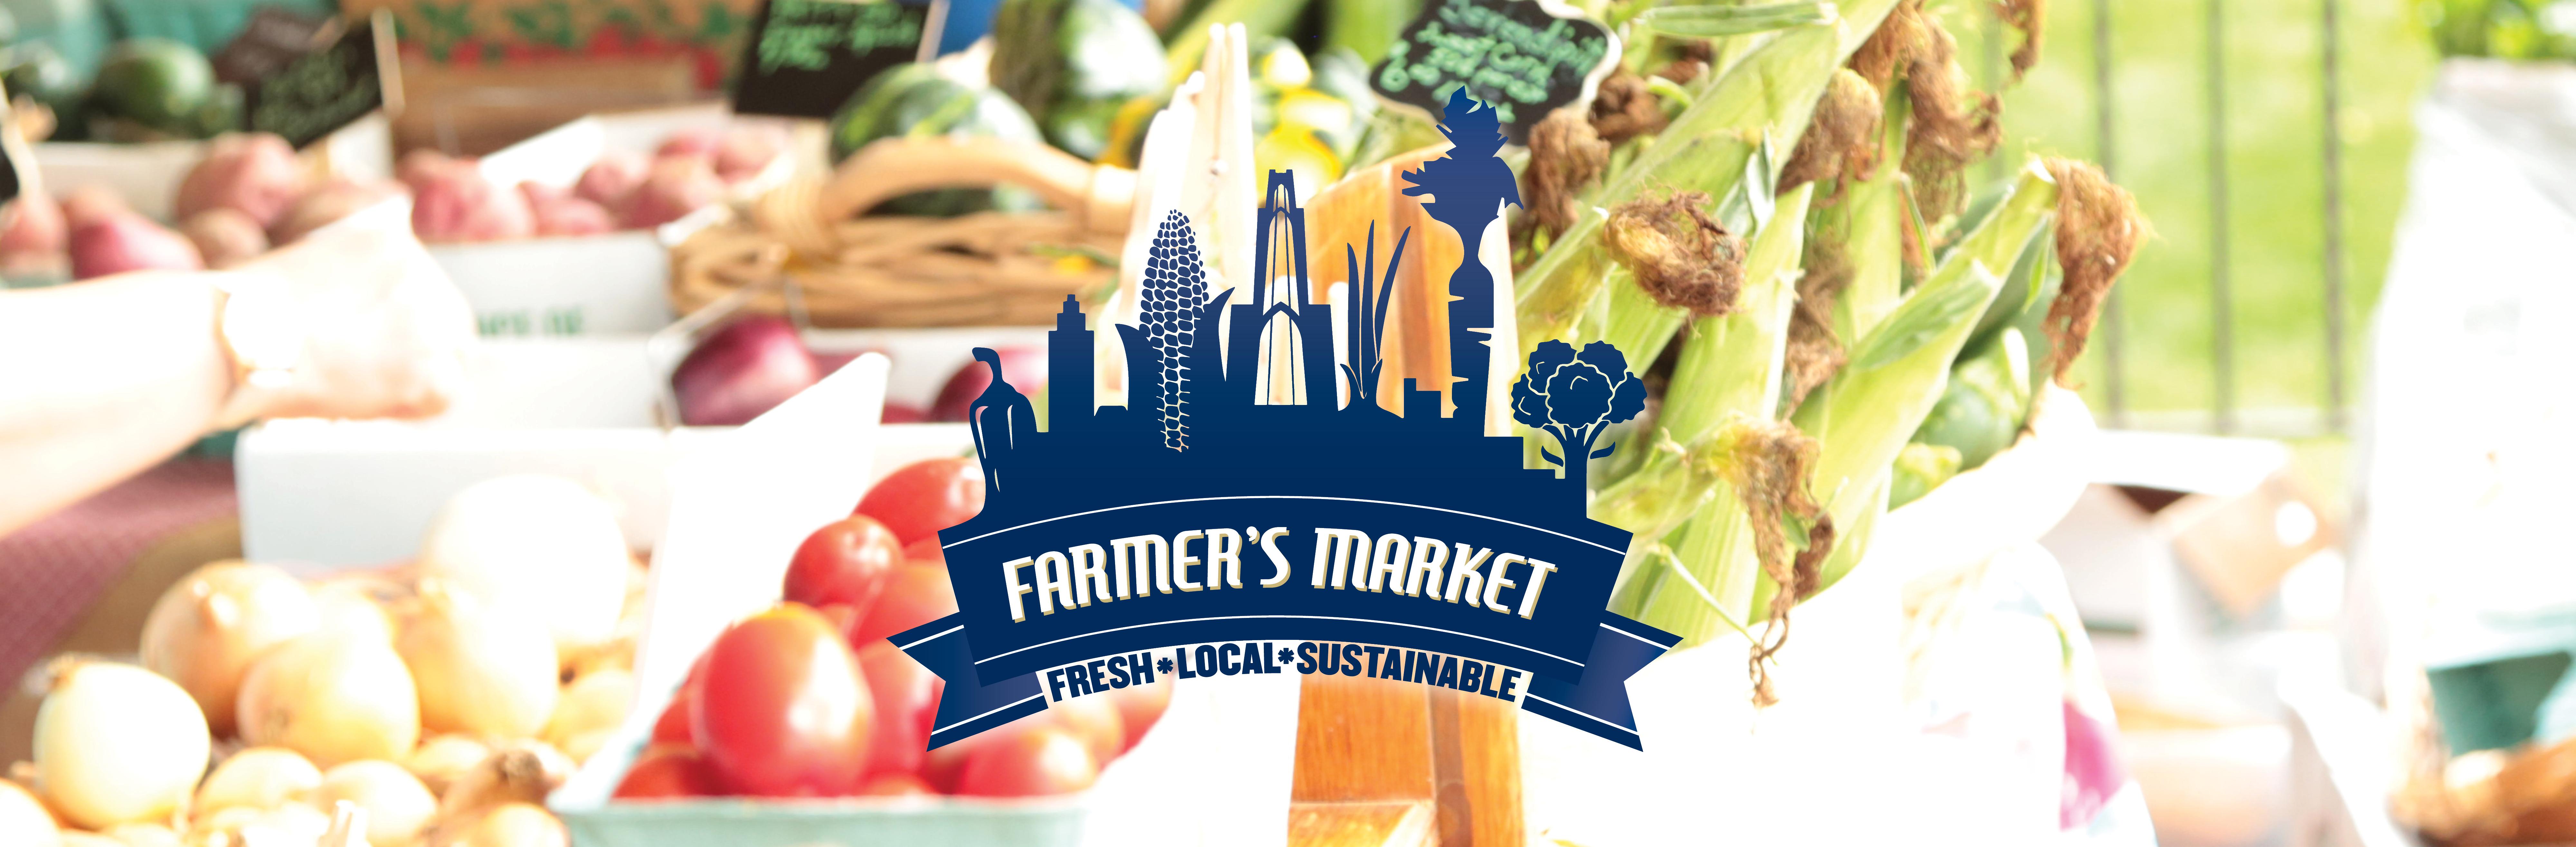 FarmersMarket_Slide